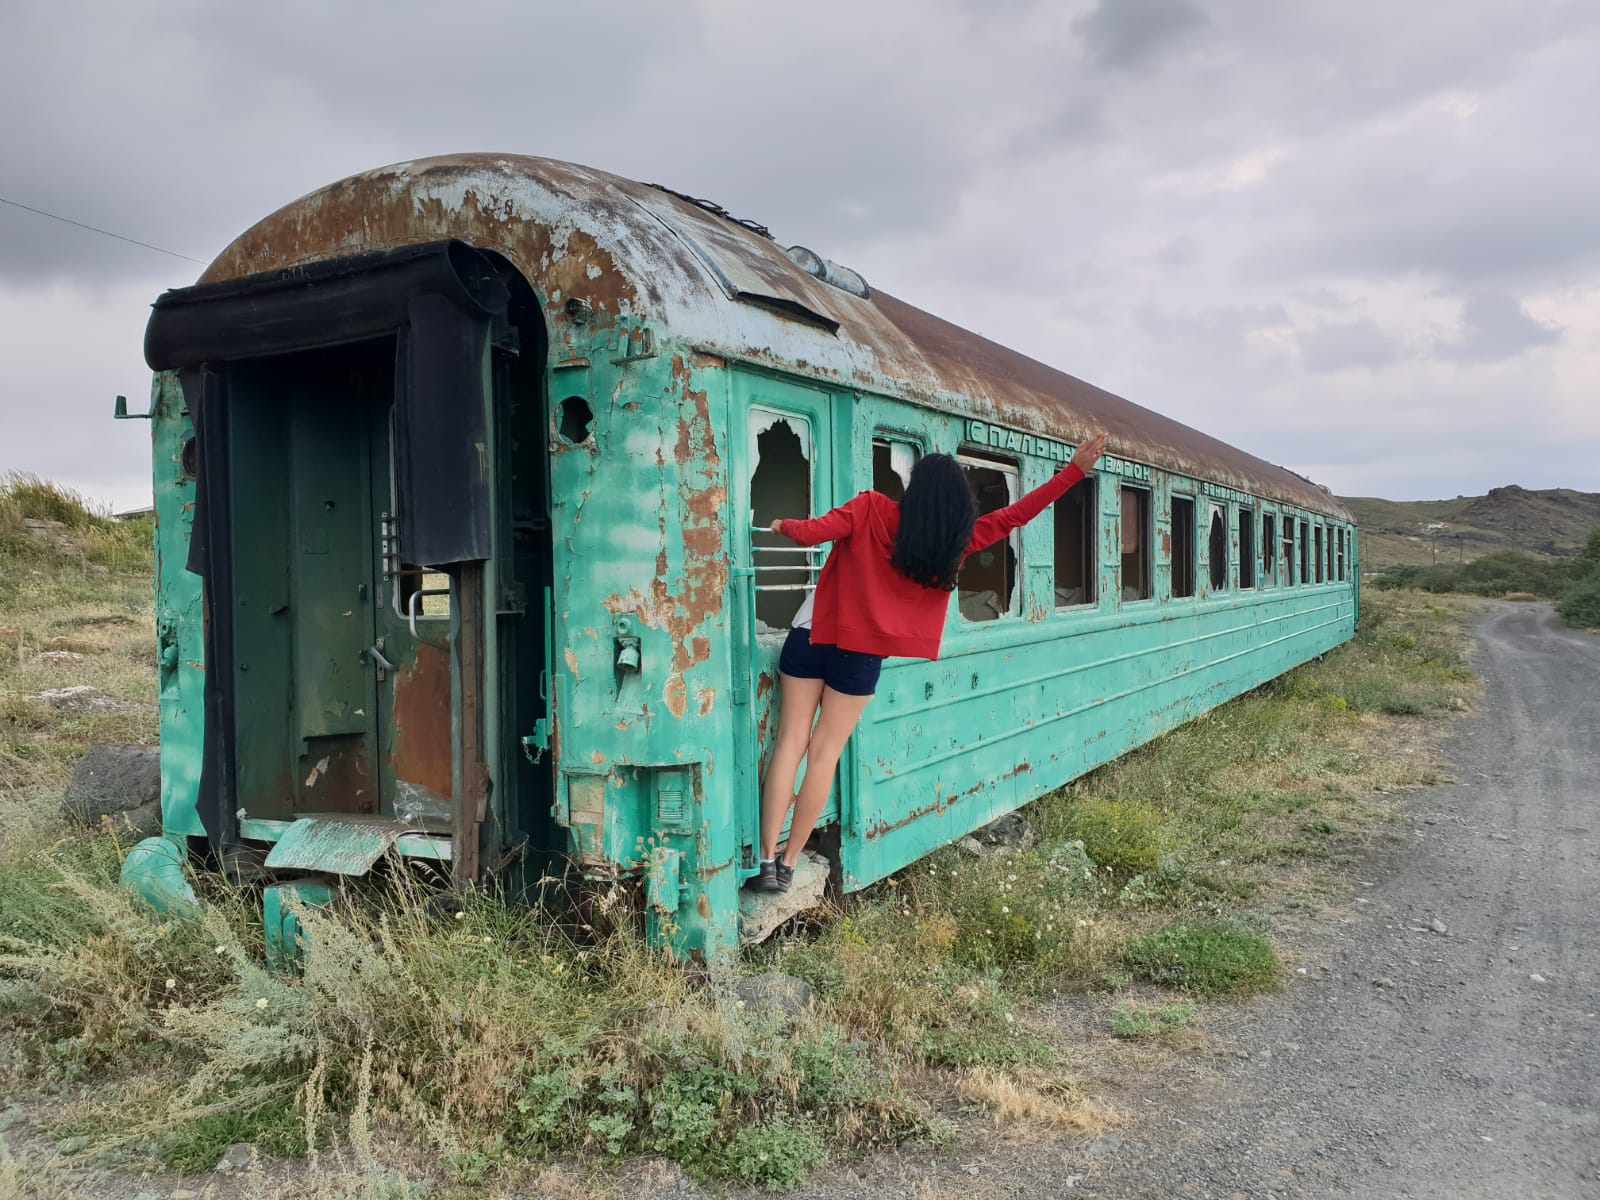 Armenia - Jezioro Sevan, opuszczony pociąg